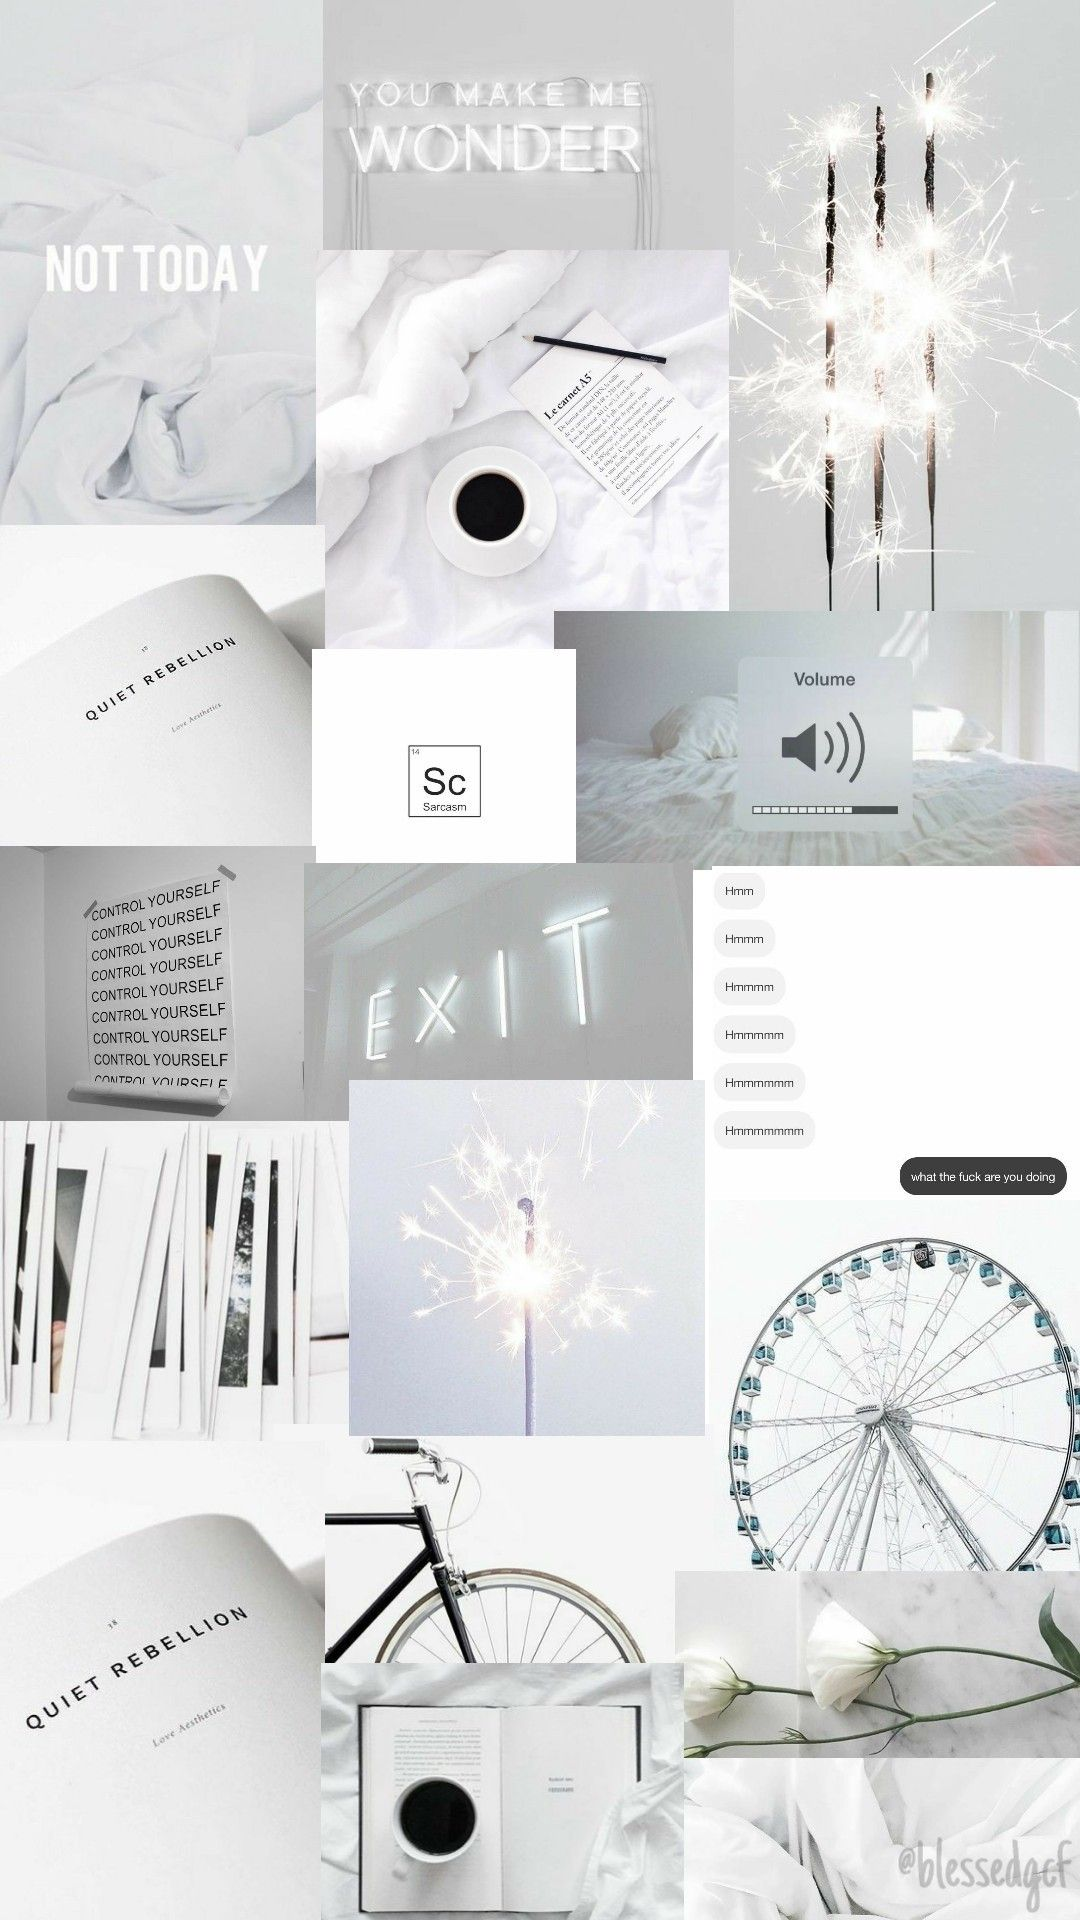 Pinterest Tiaaddie ☆ おしゃれな壁紙背景, フォトコラージュ, 傘アート